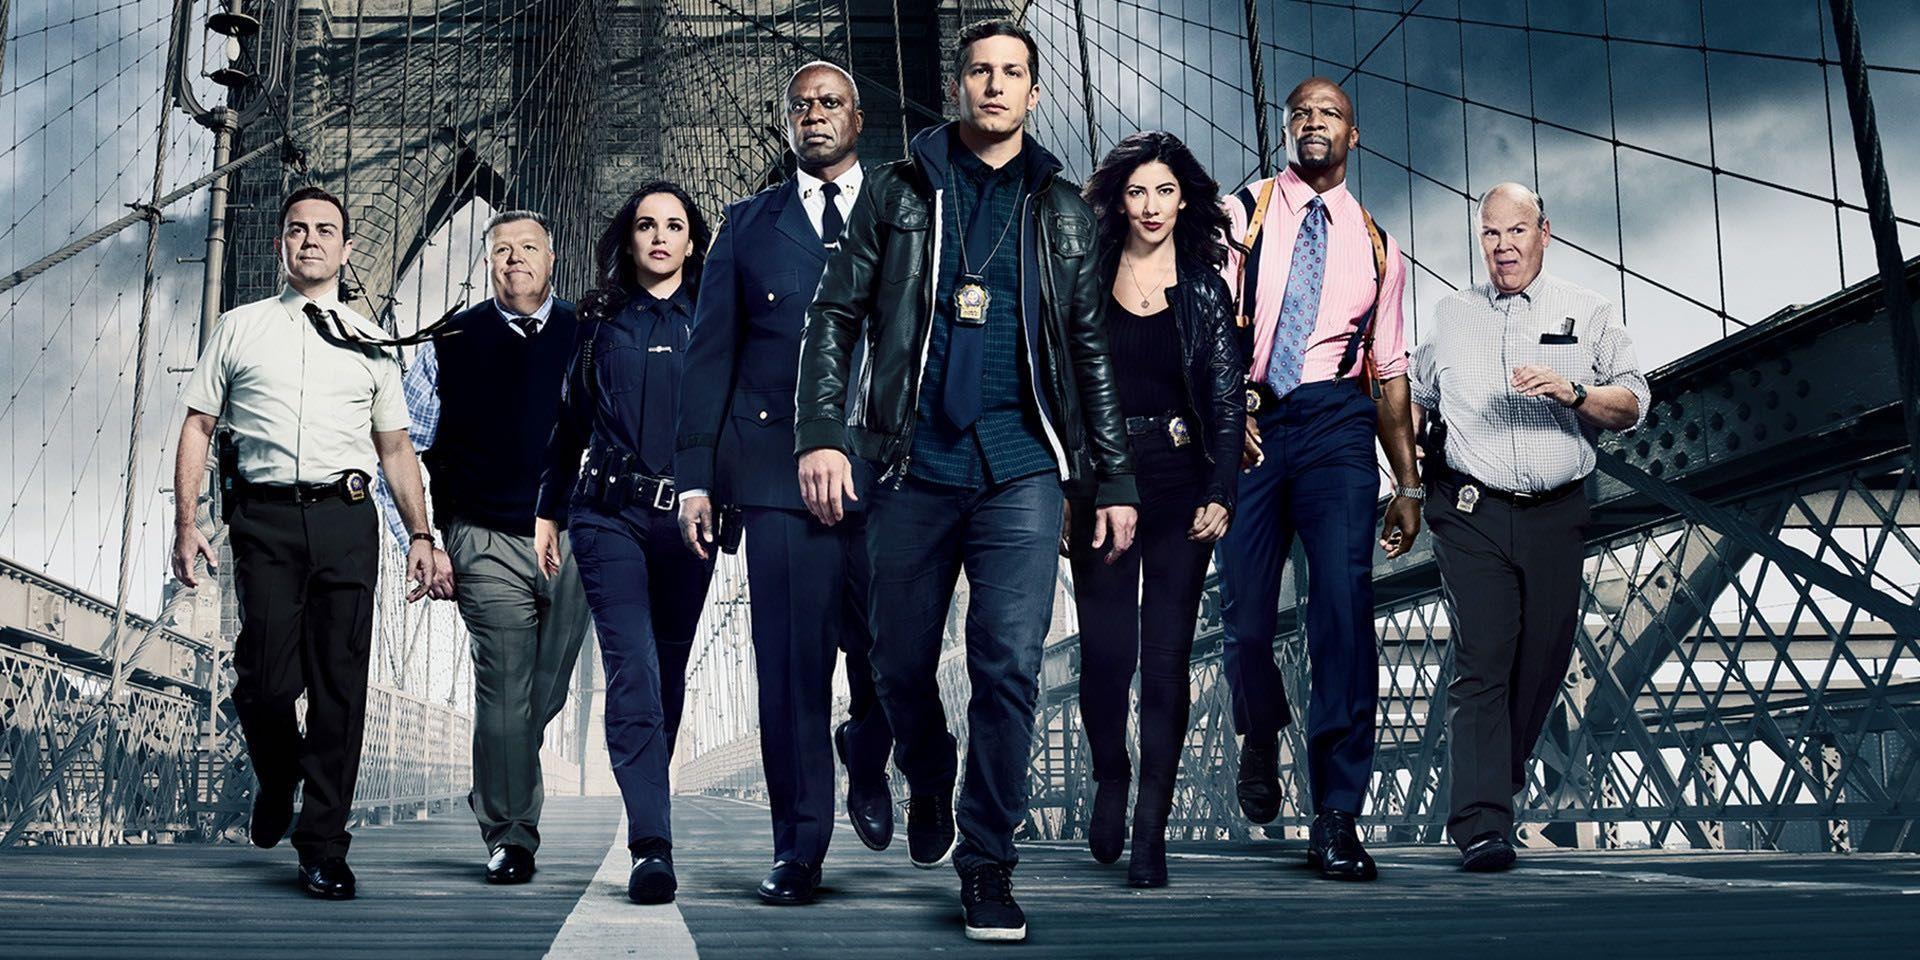 Brooklyn Nine-Nine Season 8: plot, Cast and Date of